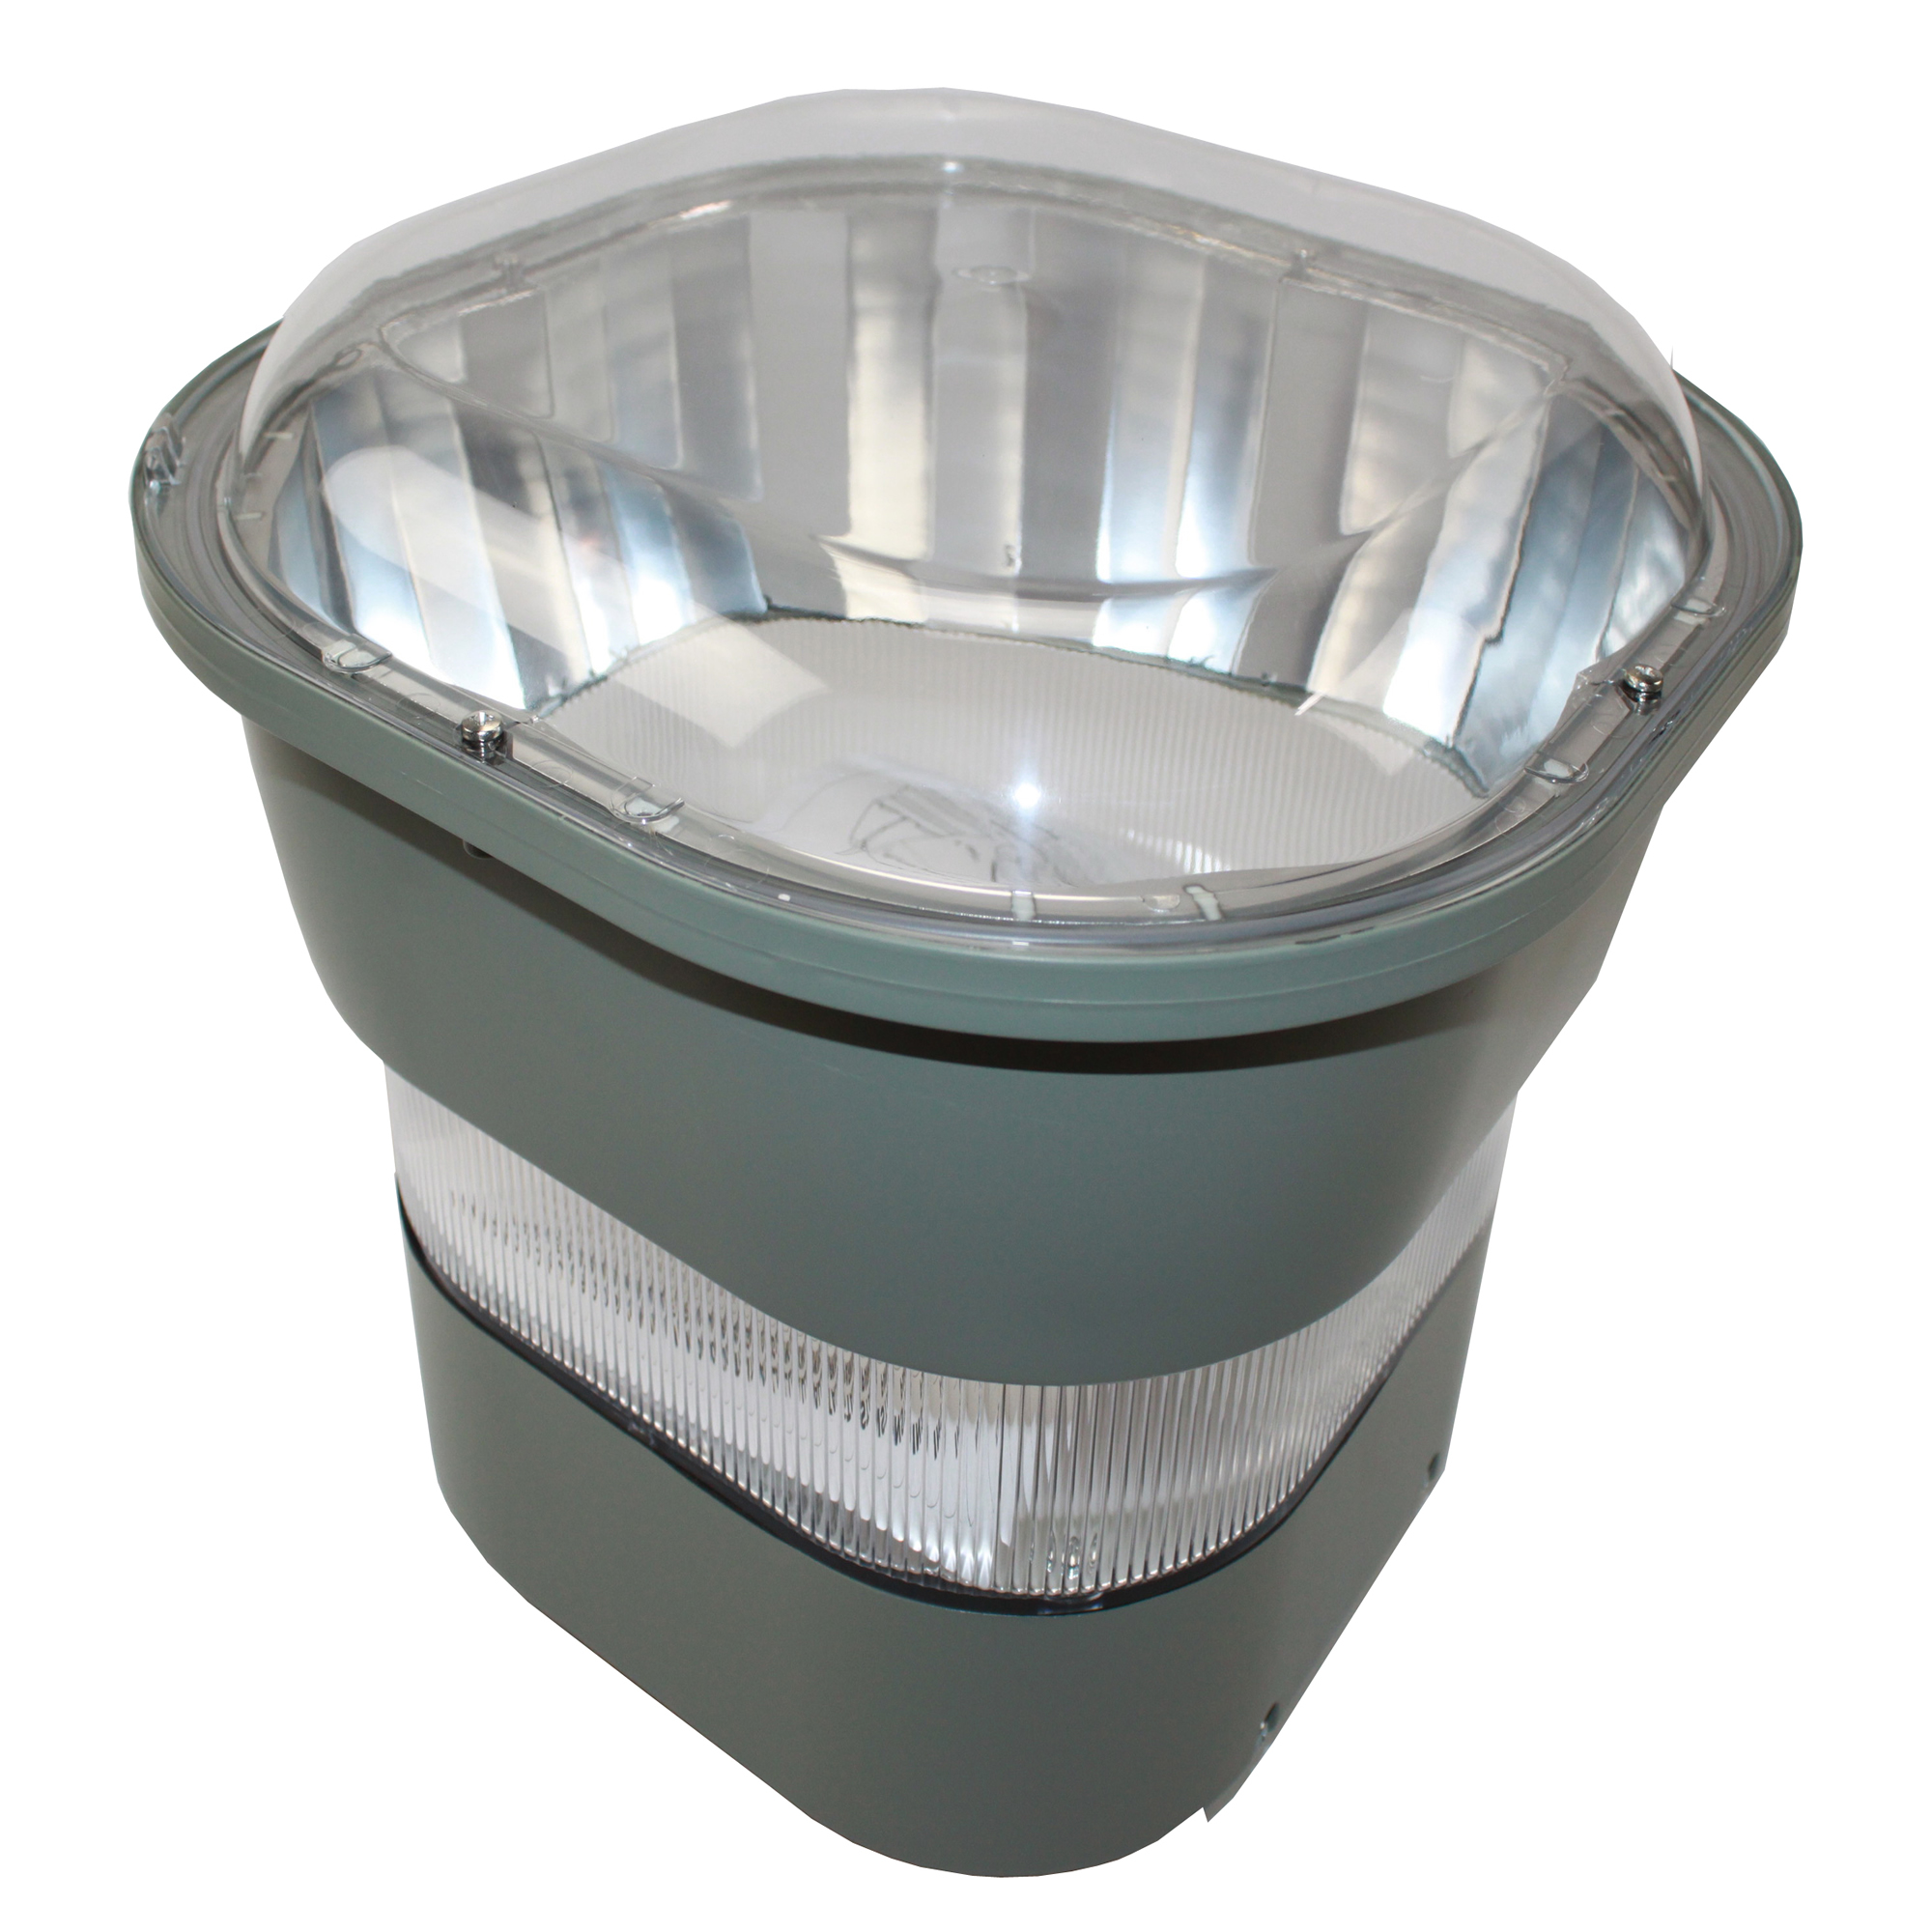 Gardco Philips Garage Bat Light Luminaire GP1 175W MH Par...